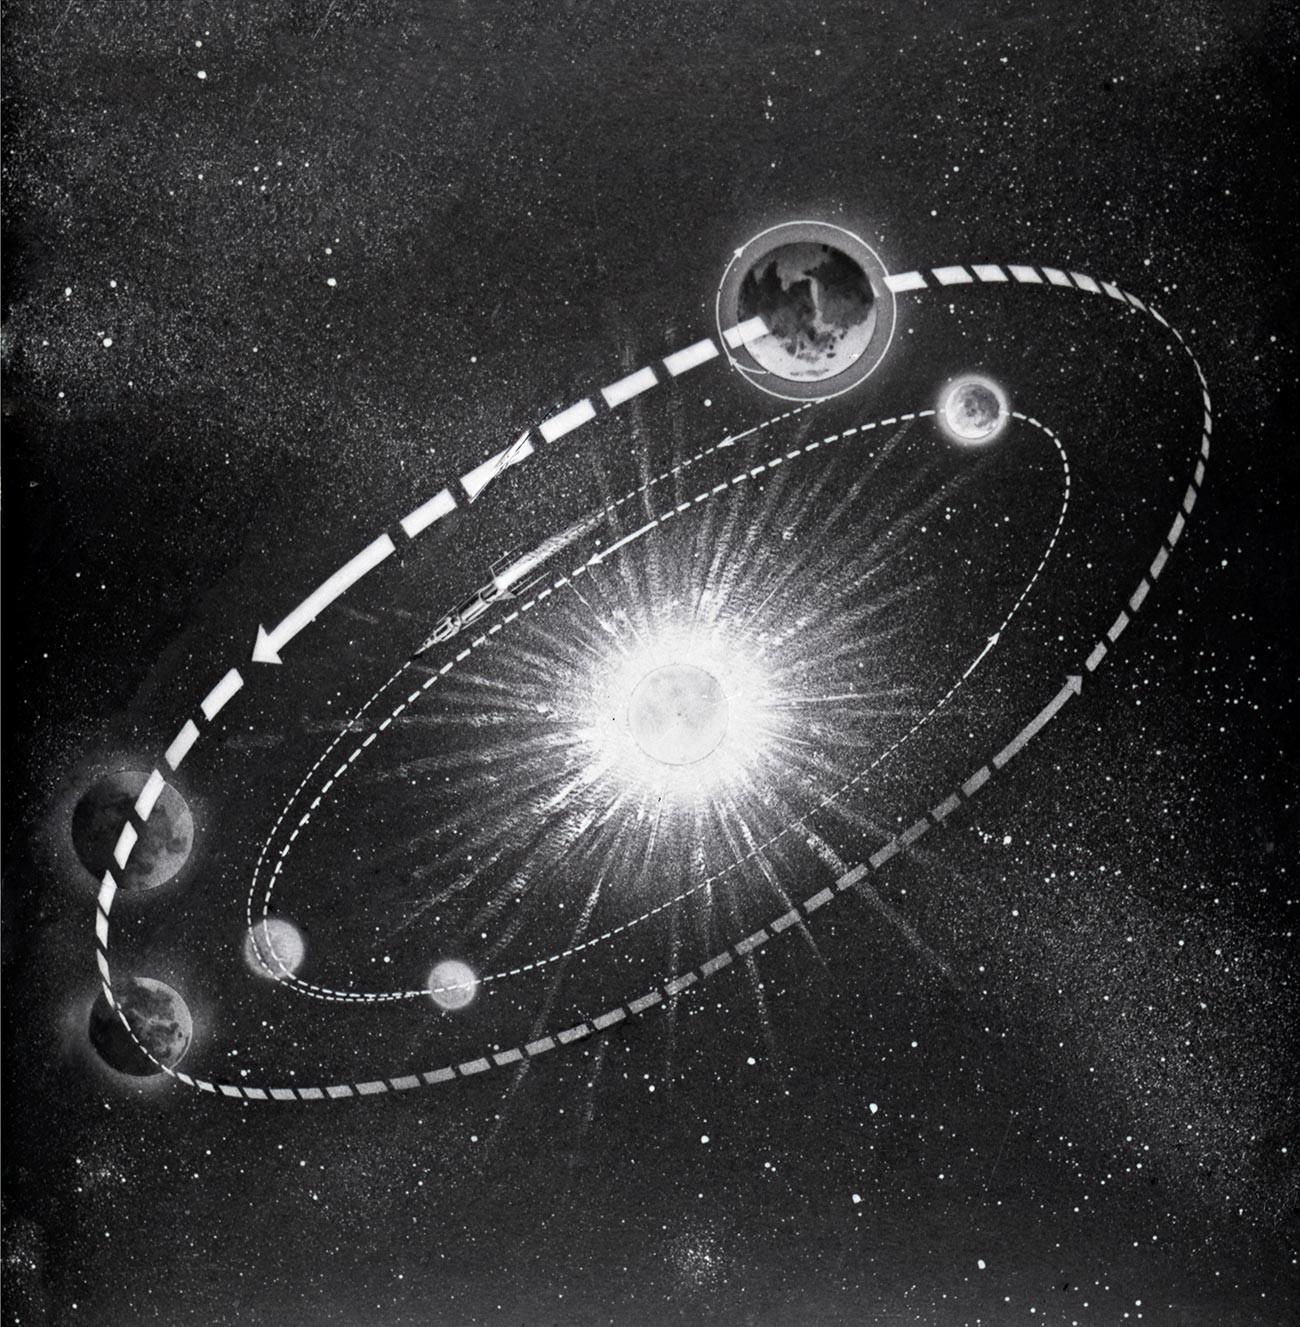 Diagrama de voo da espaçonave Venera-1 para Vênus